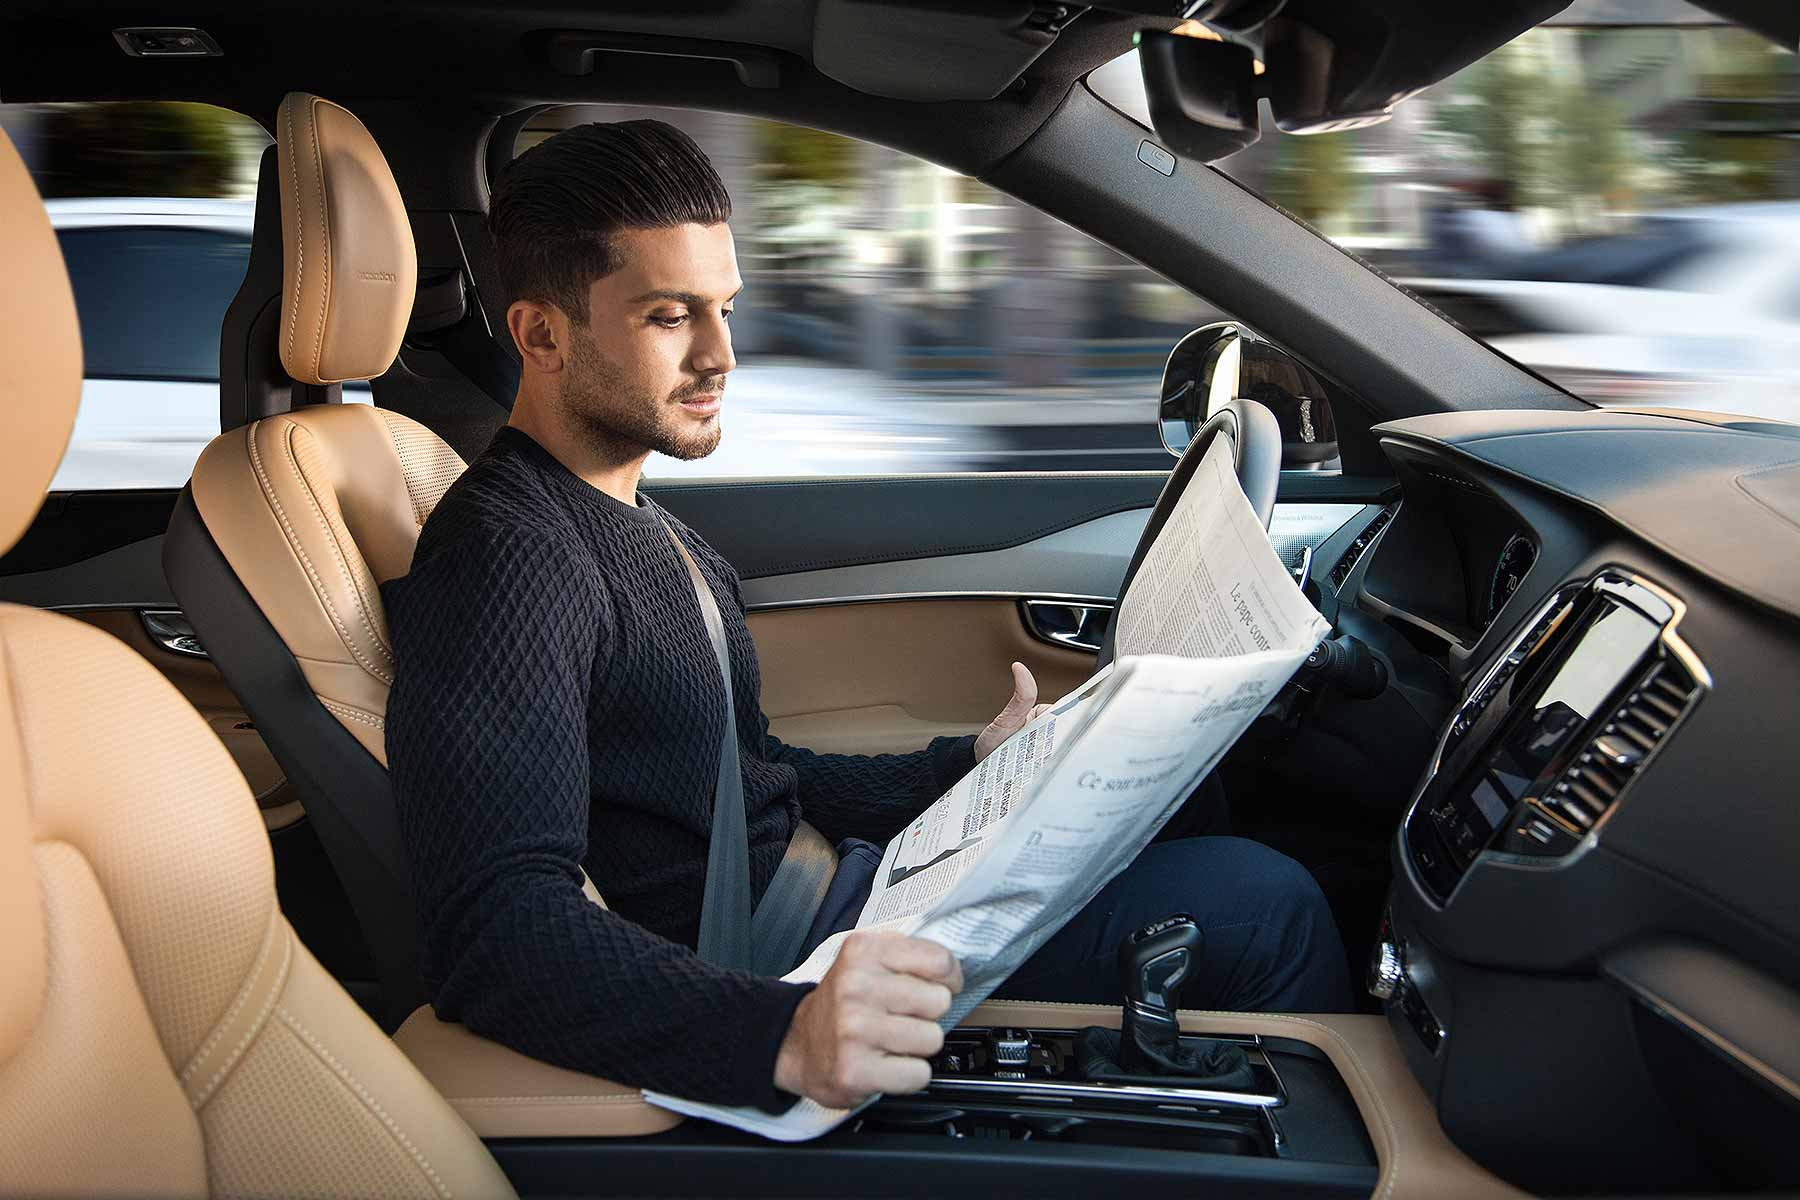 Volvo autonomous driving demonstration